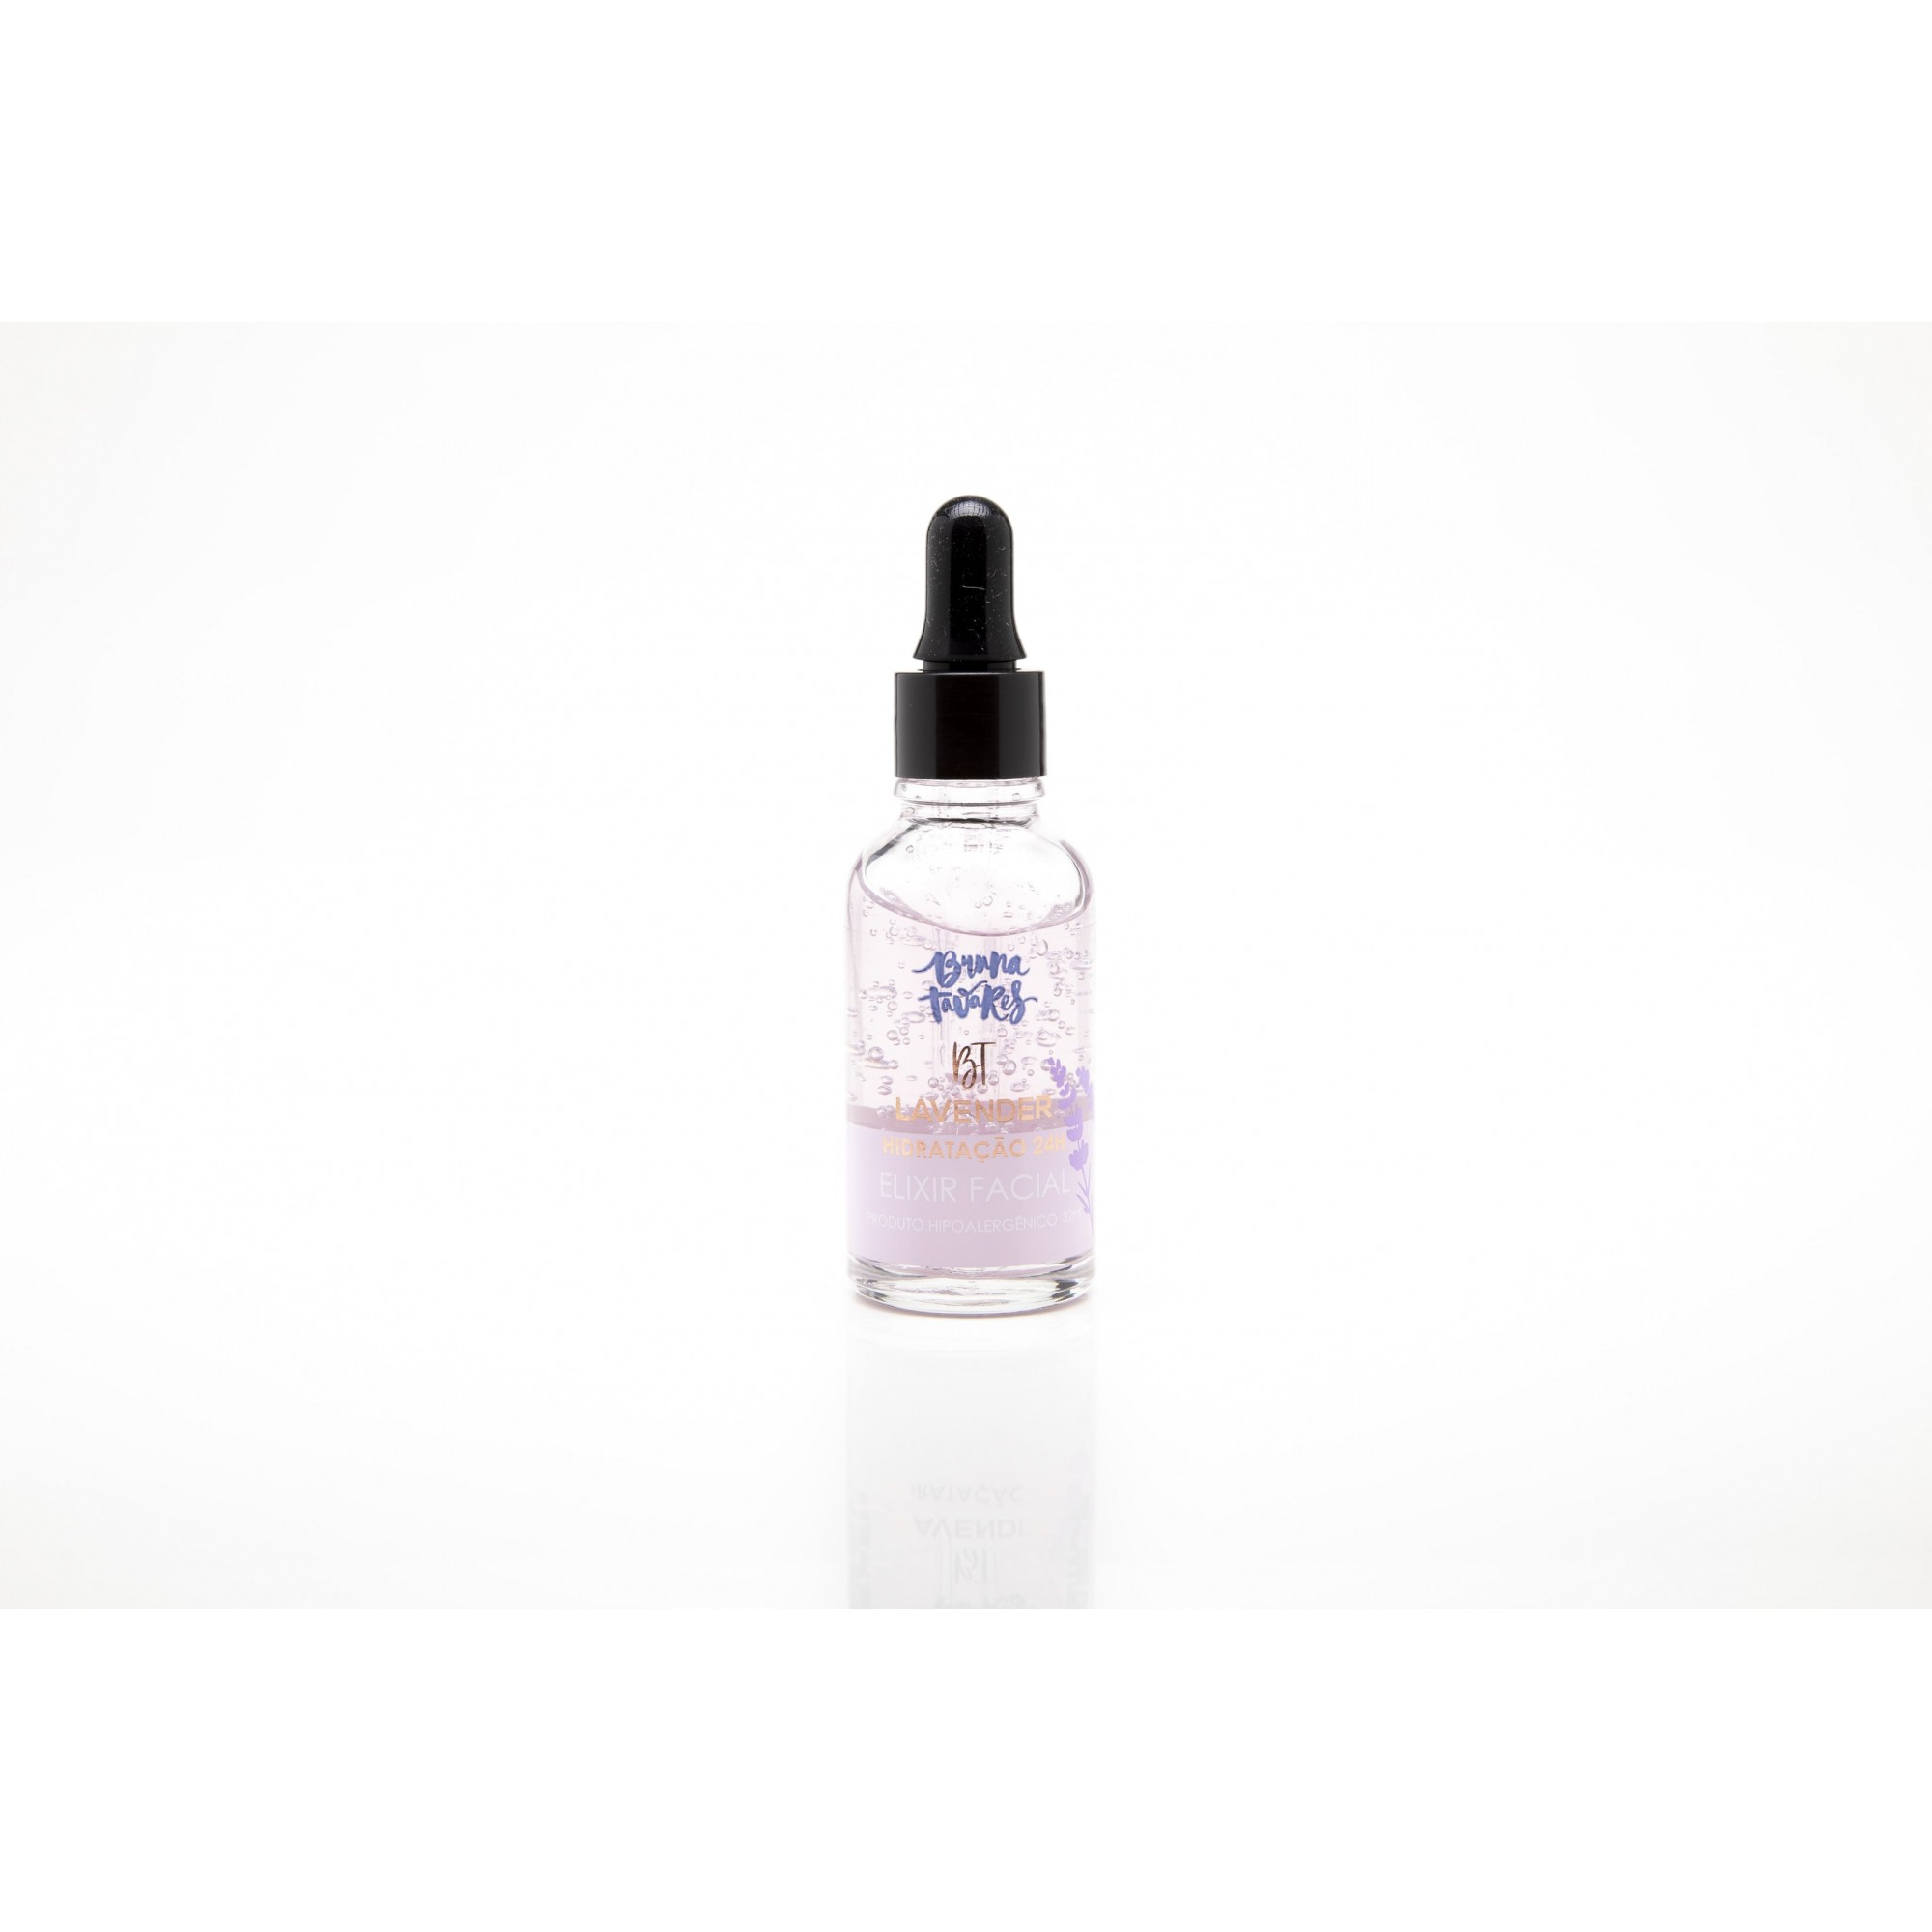 Lavender Elixir facial - Bruna Tavares